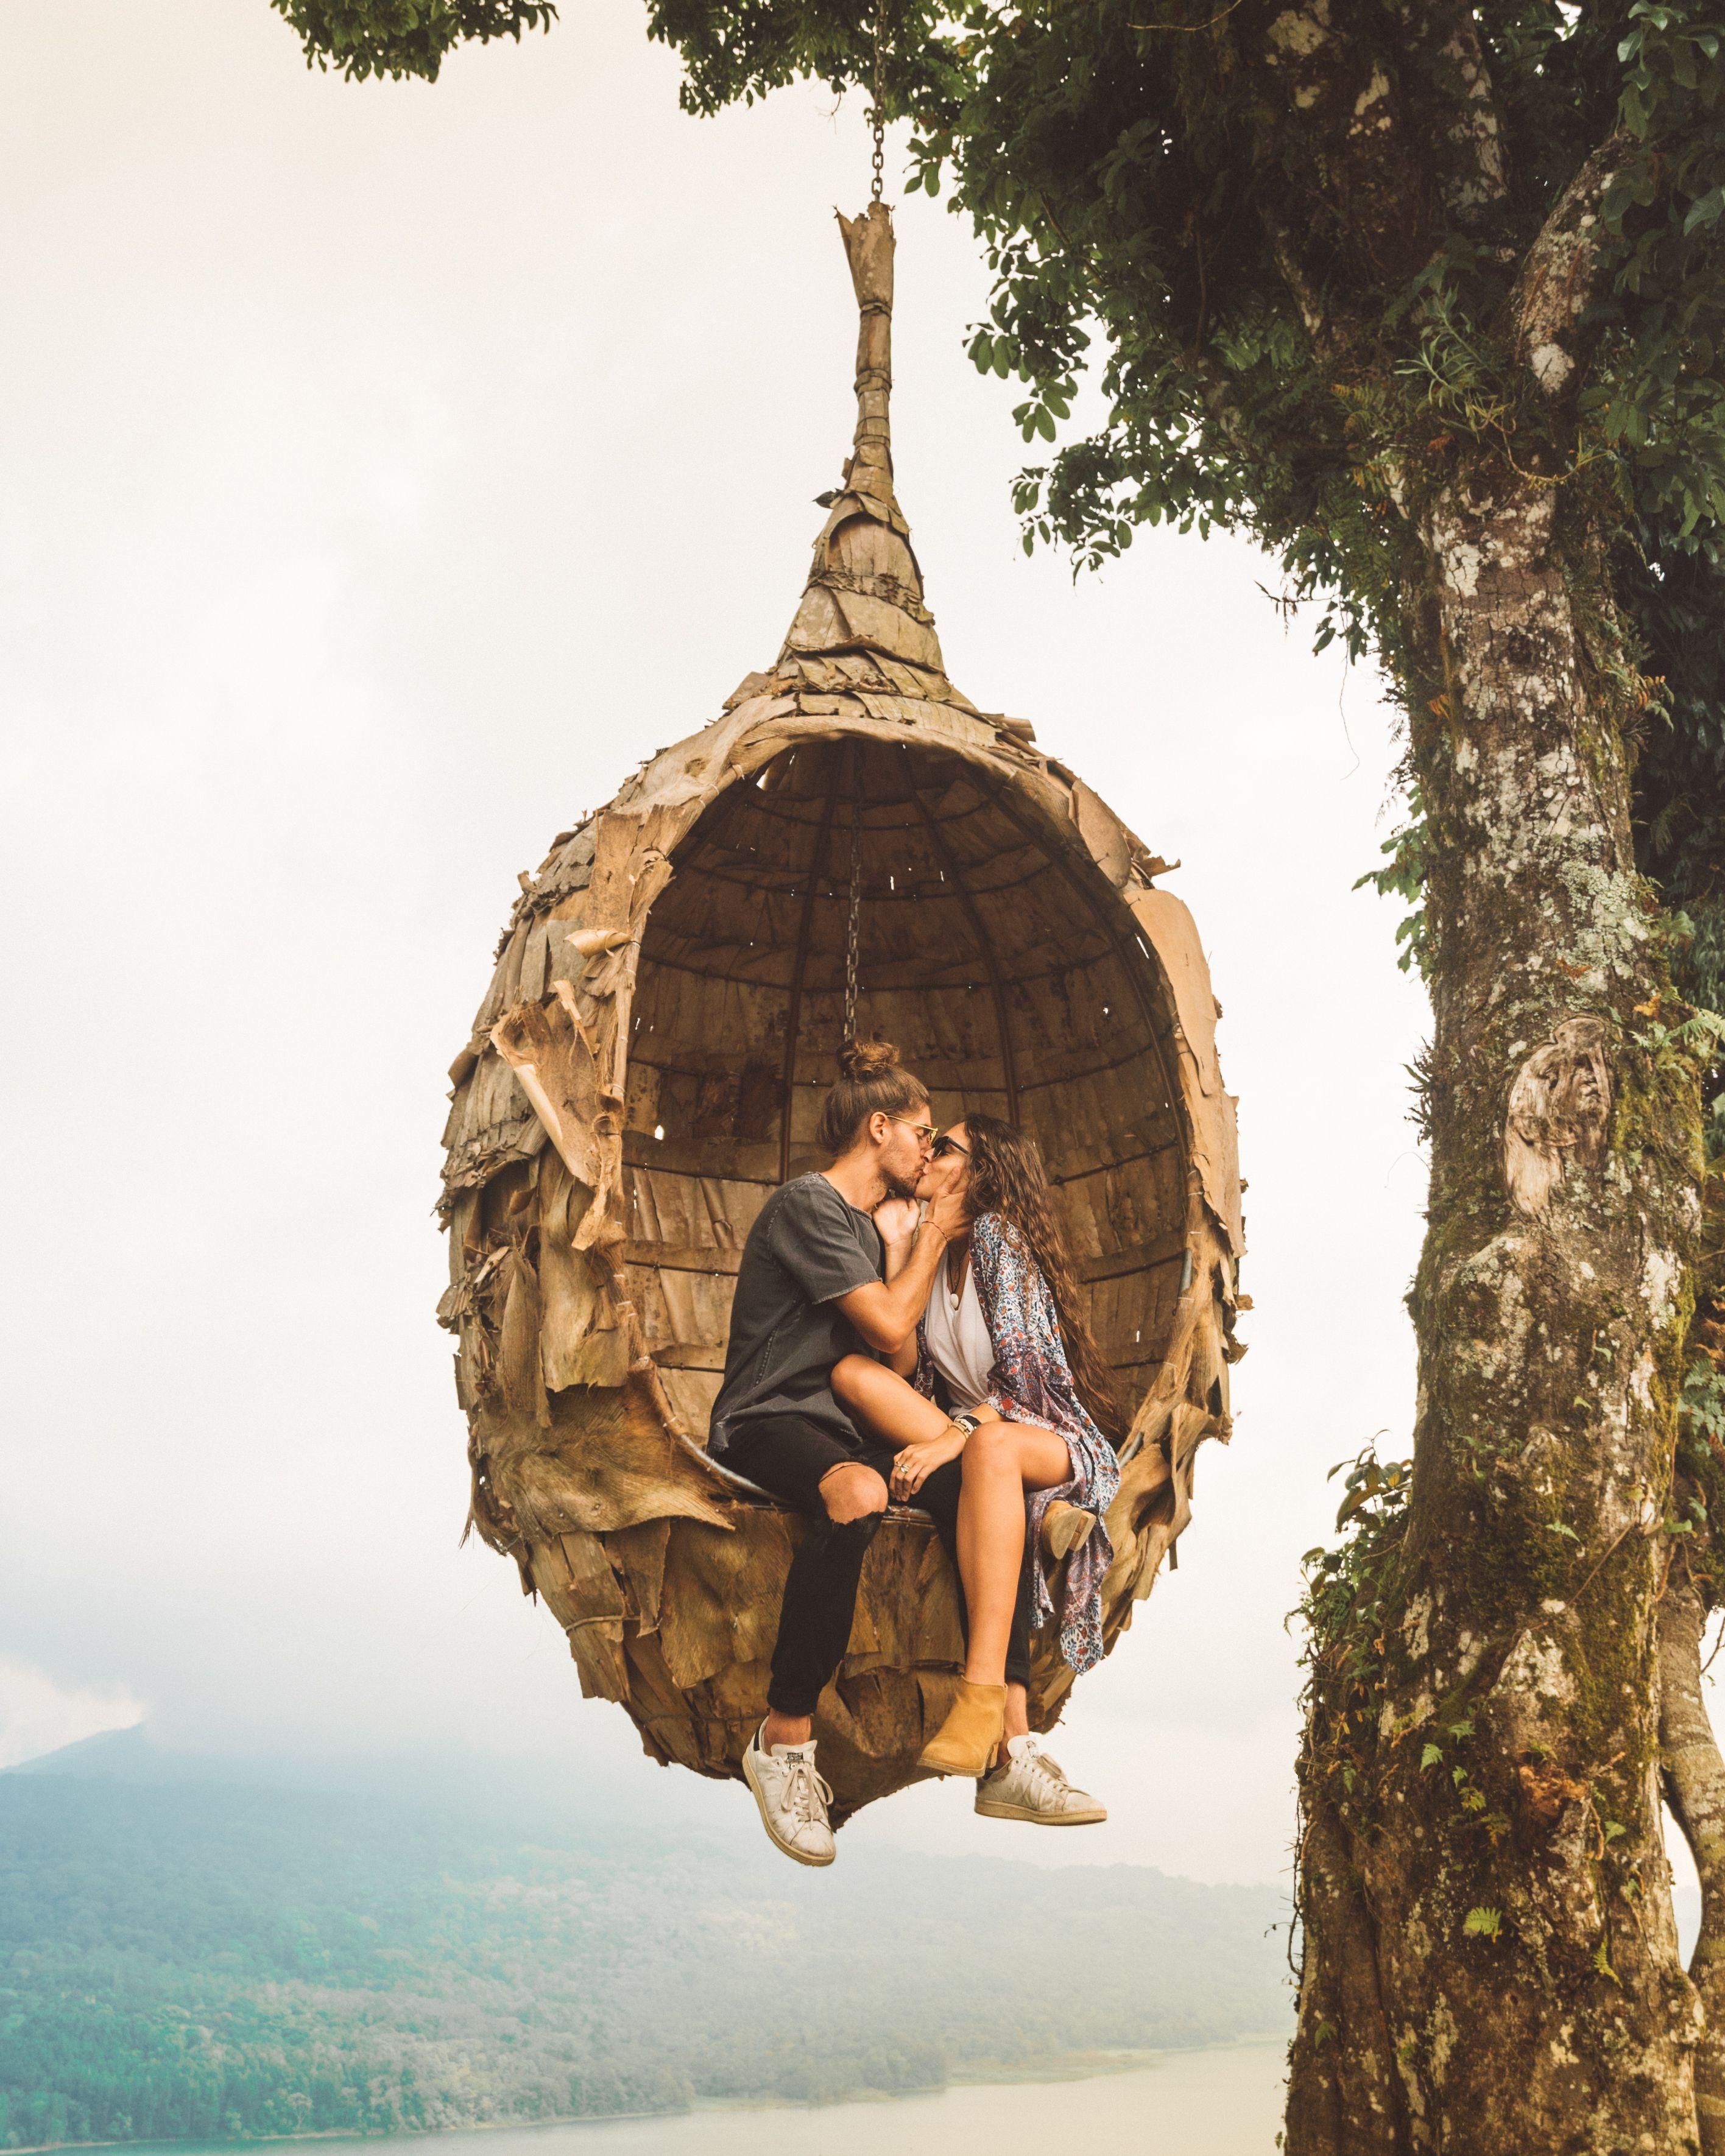 #kiss#kisses#bali#baliswing#explorebali#love#wonderfulplaces#travel#travelcouple#couple#topoftheworld#loveyou#iloveyou#boyfriend#girlfriend#gf#bf#couplegoals#couple#relationship#relationshipgoals#baliindonesia#happy#passionpassport#onewayticketrip#discoverearth#earthpix#asia